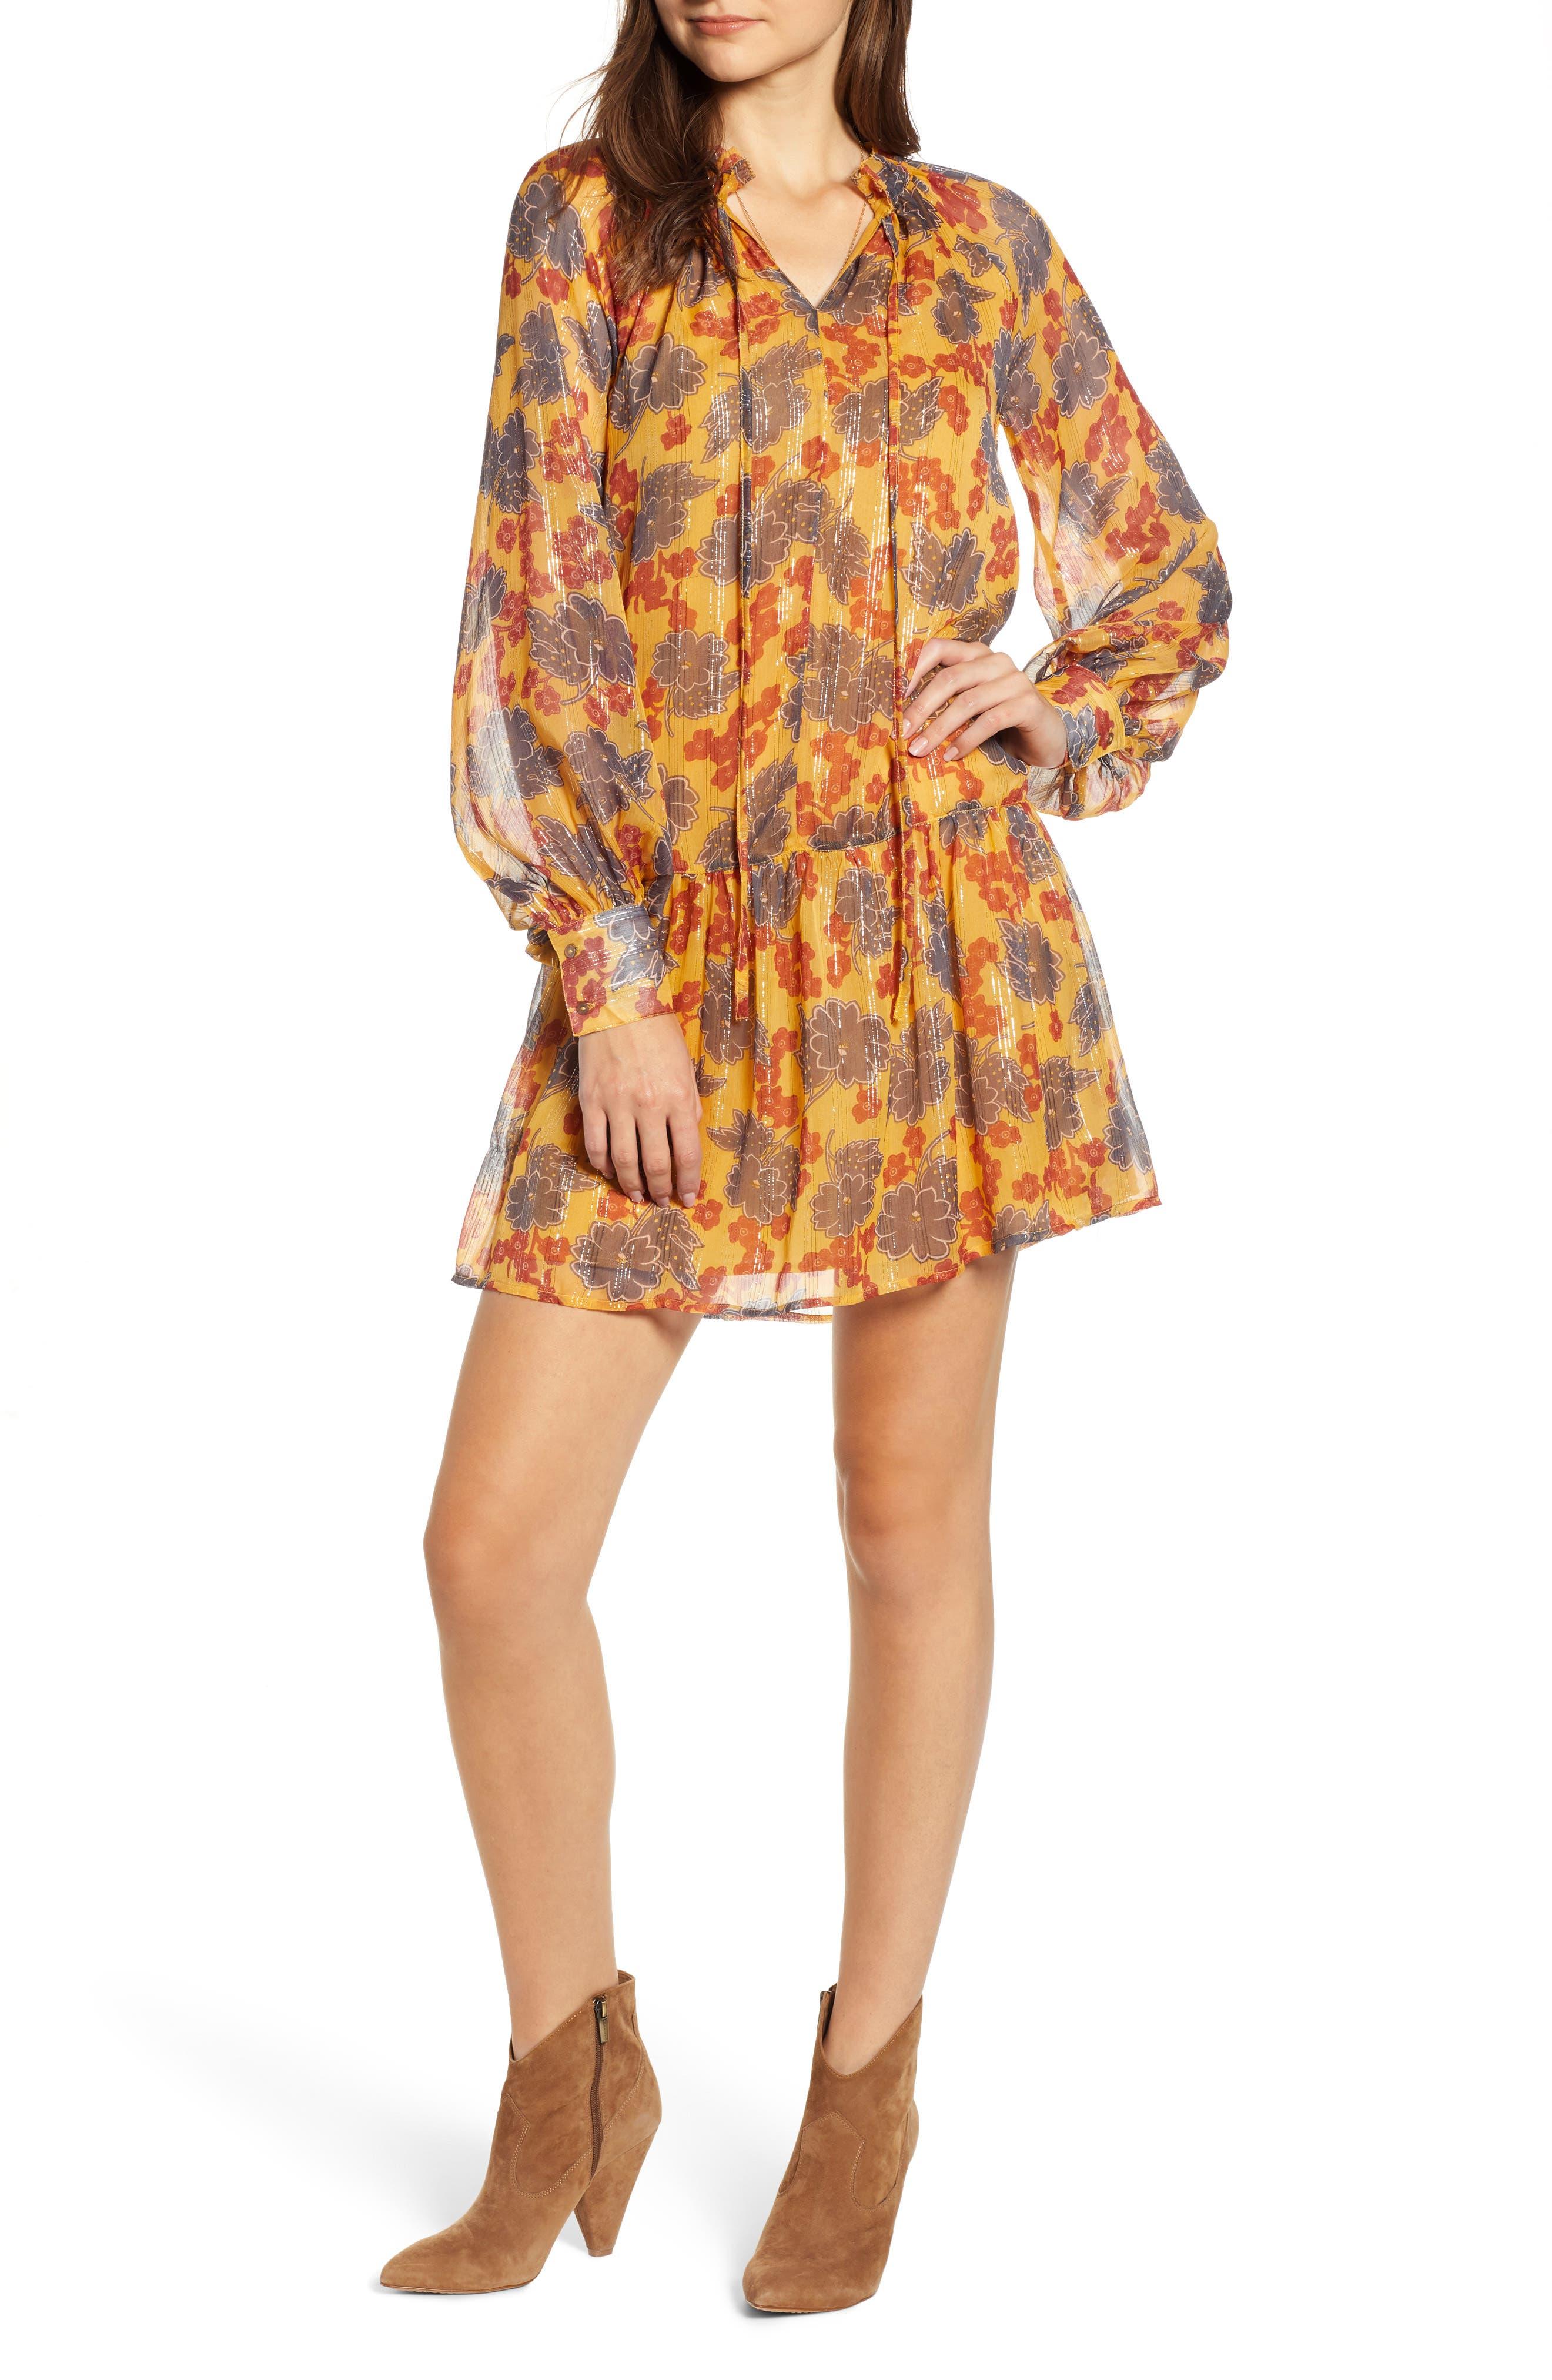 Metallic Stripe Floral Print Dress,                         Main,                         color, YELLOW AND BURGUNDY